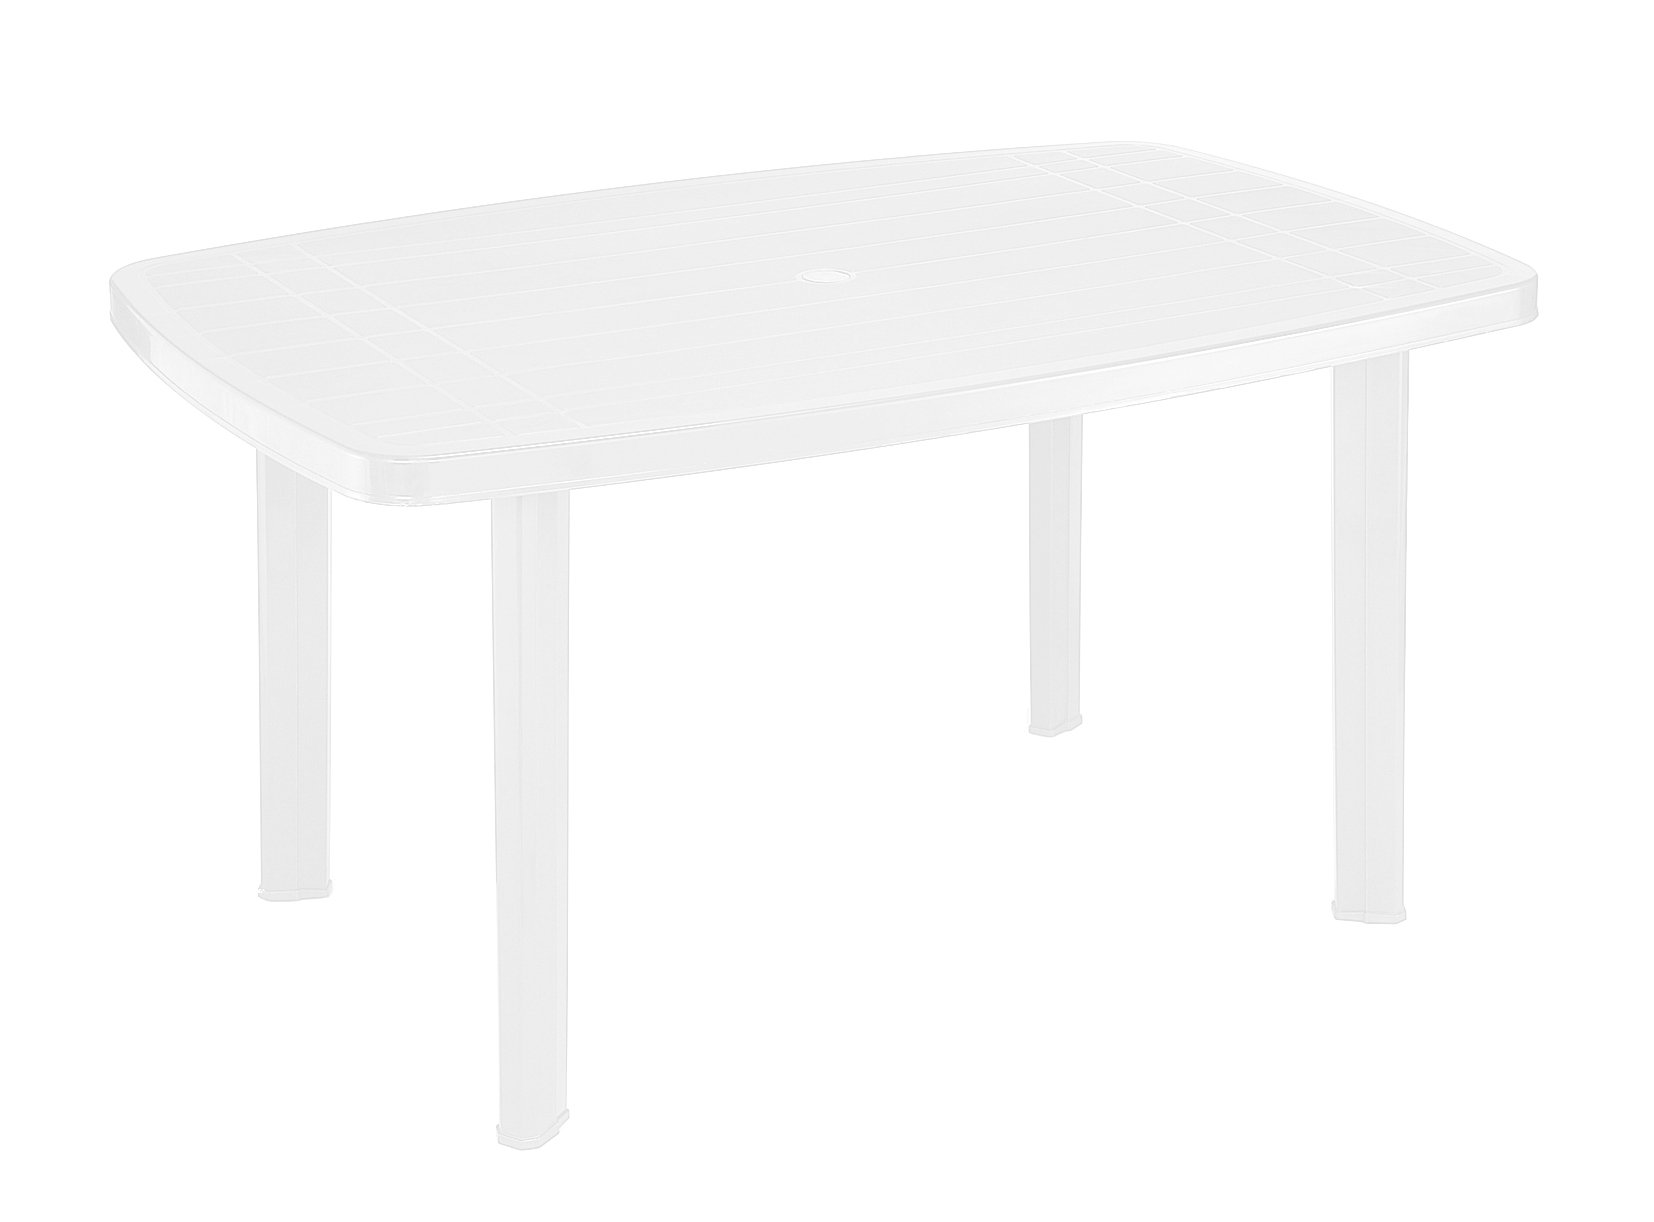 Plastikinis stalas FARO ovalus, baltos spalvos 137x85x72cm, maks. apkrova iki 60kg